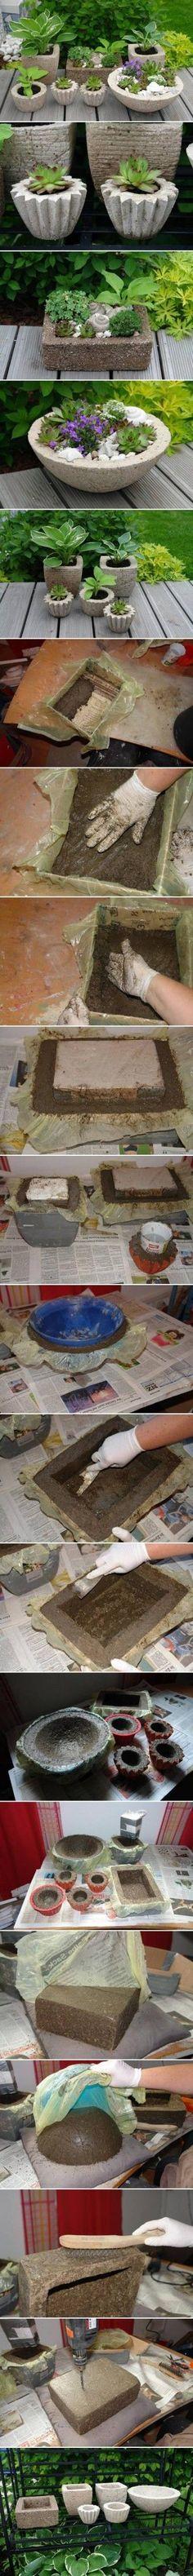 Diversos modelos de vasos de Cimento.